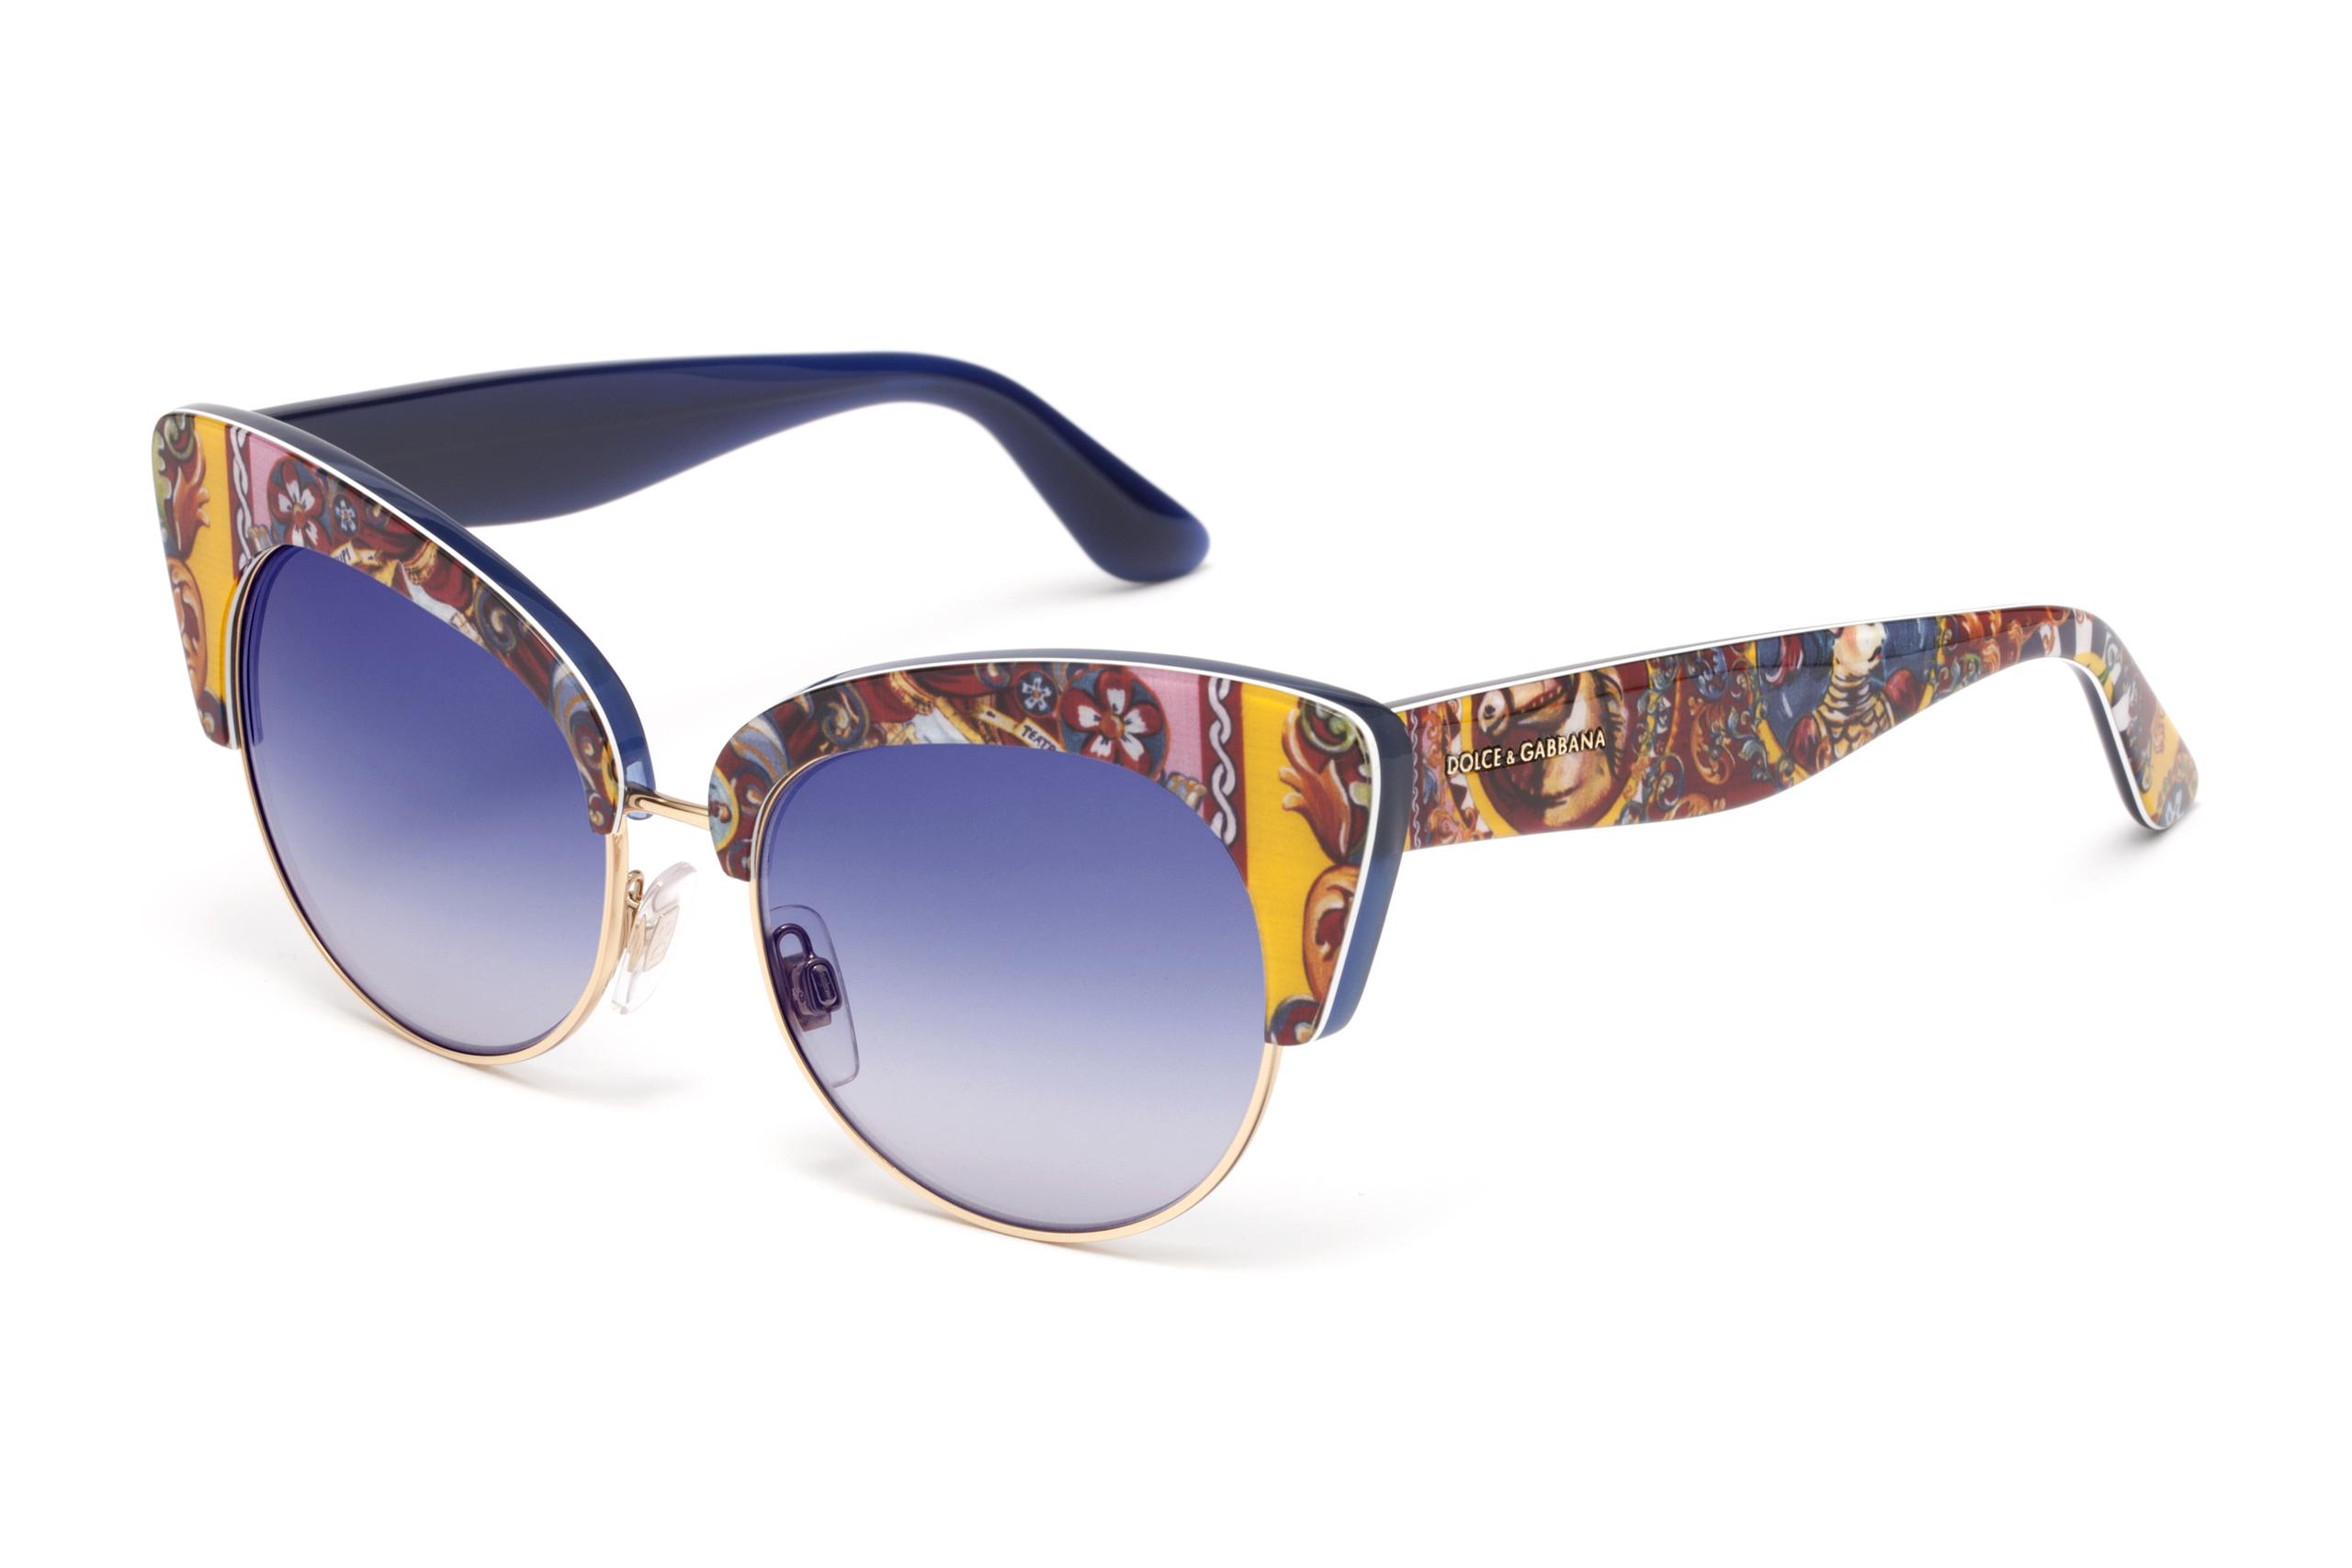 Foto de Gafas de sol Dolce Gabbana Sicilian Carretto (4/12)